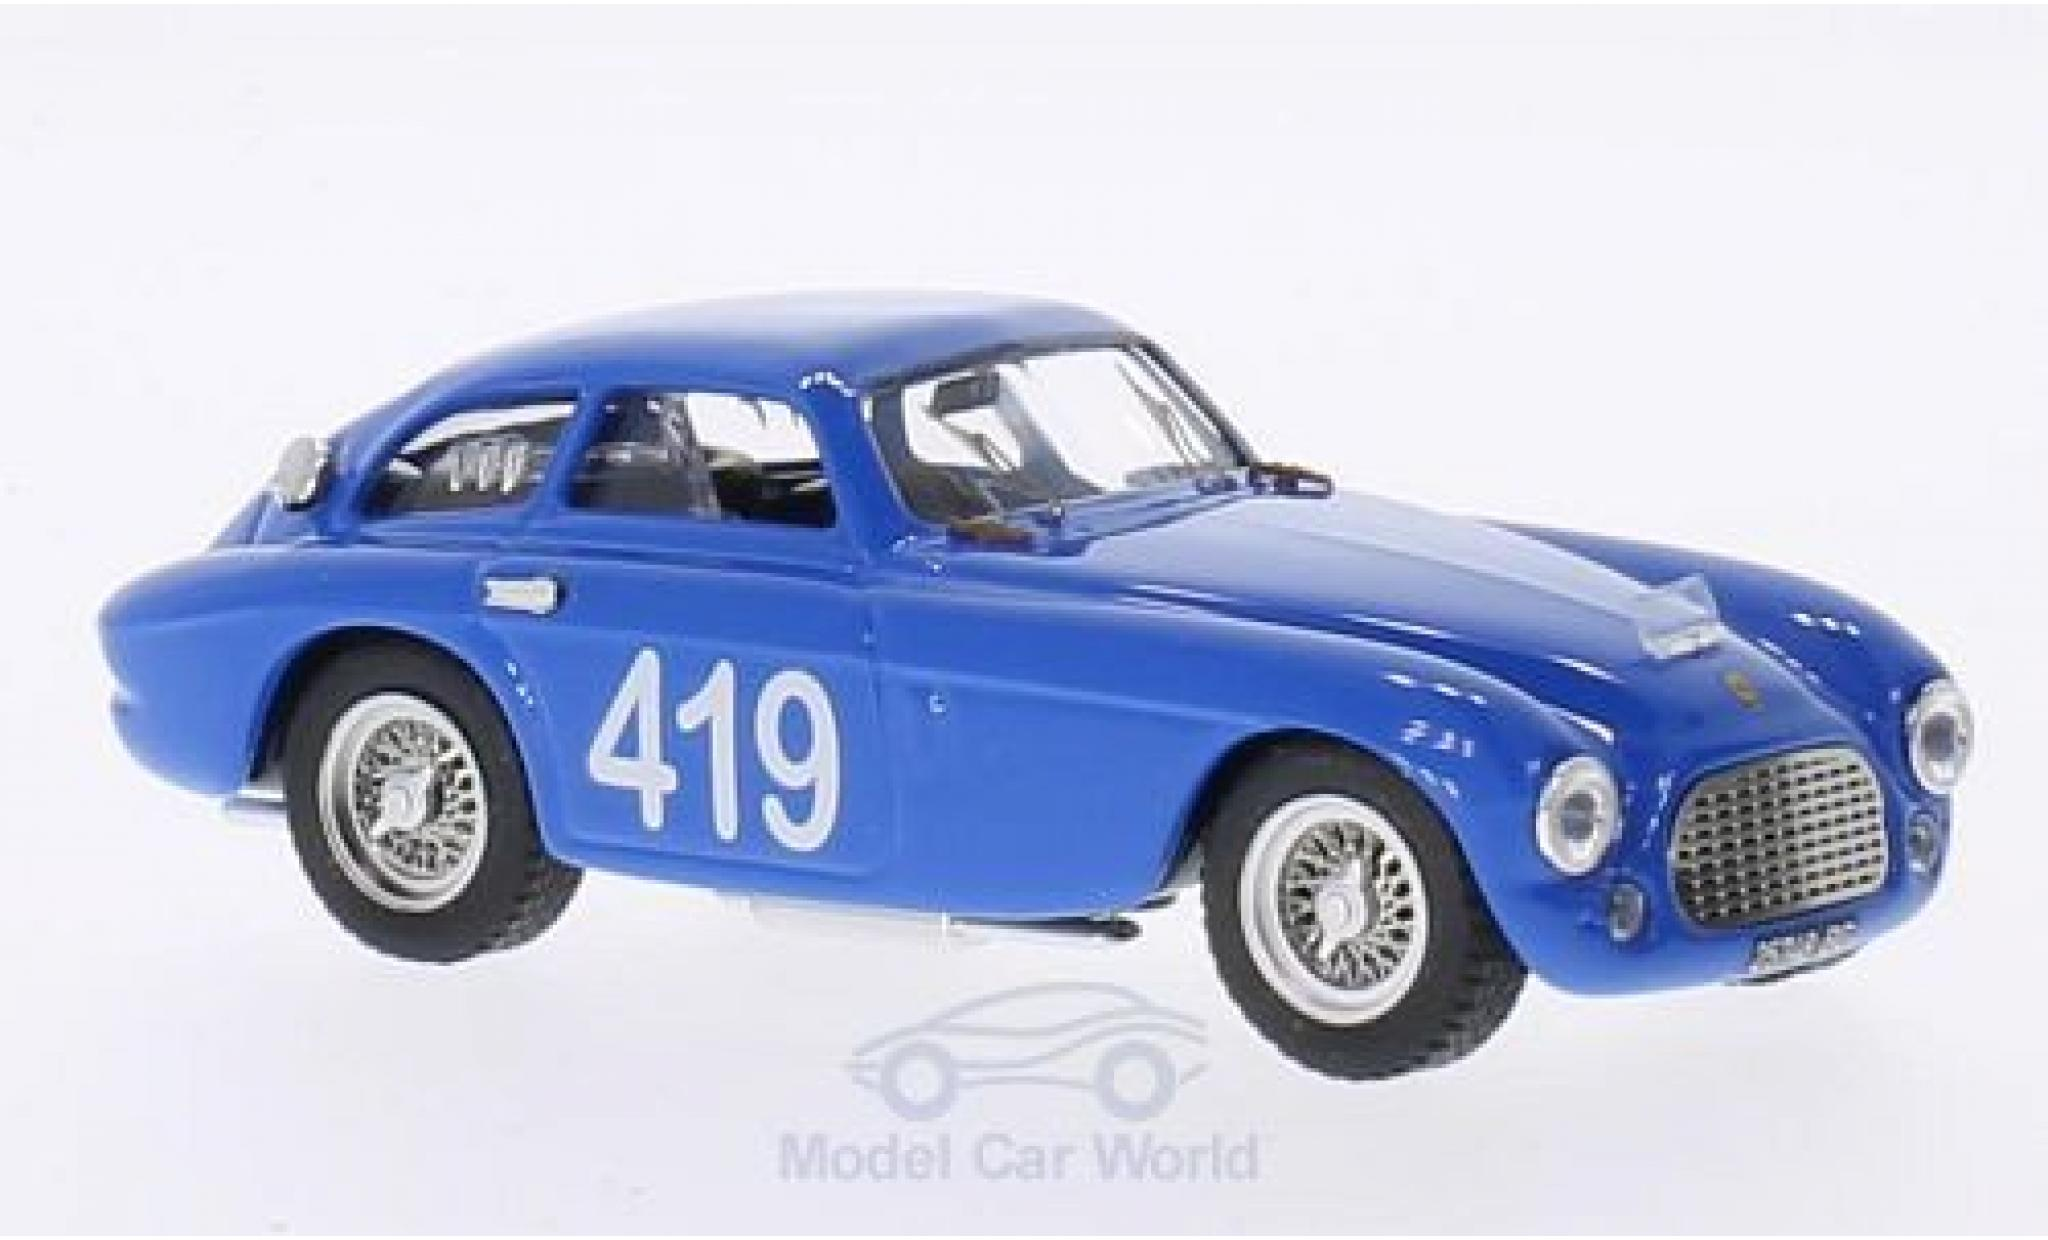 Ferrari 166 1953 1/43 Art Model MM Coupe No.419 Targa Florio G.Musitelli/F.Musitelli